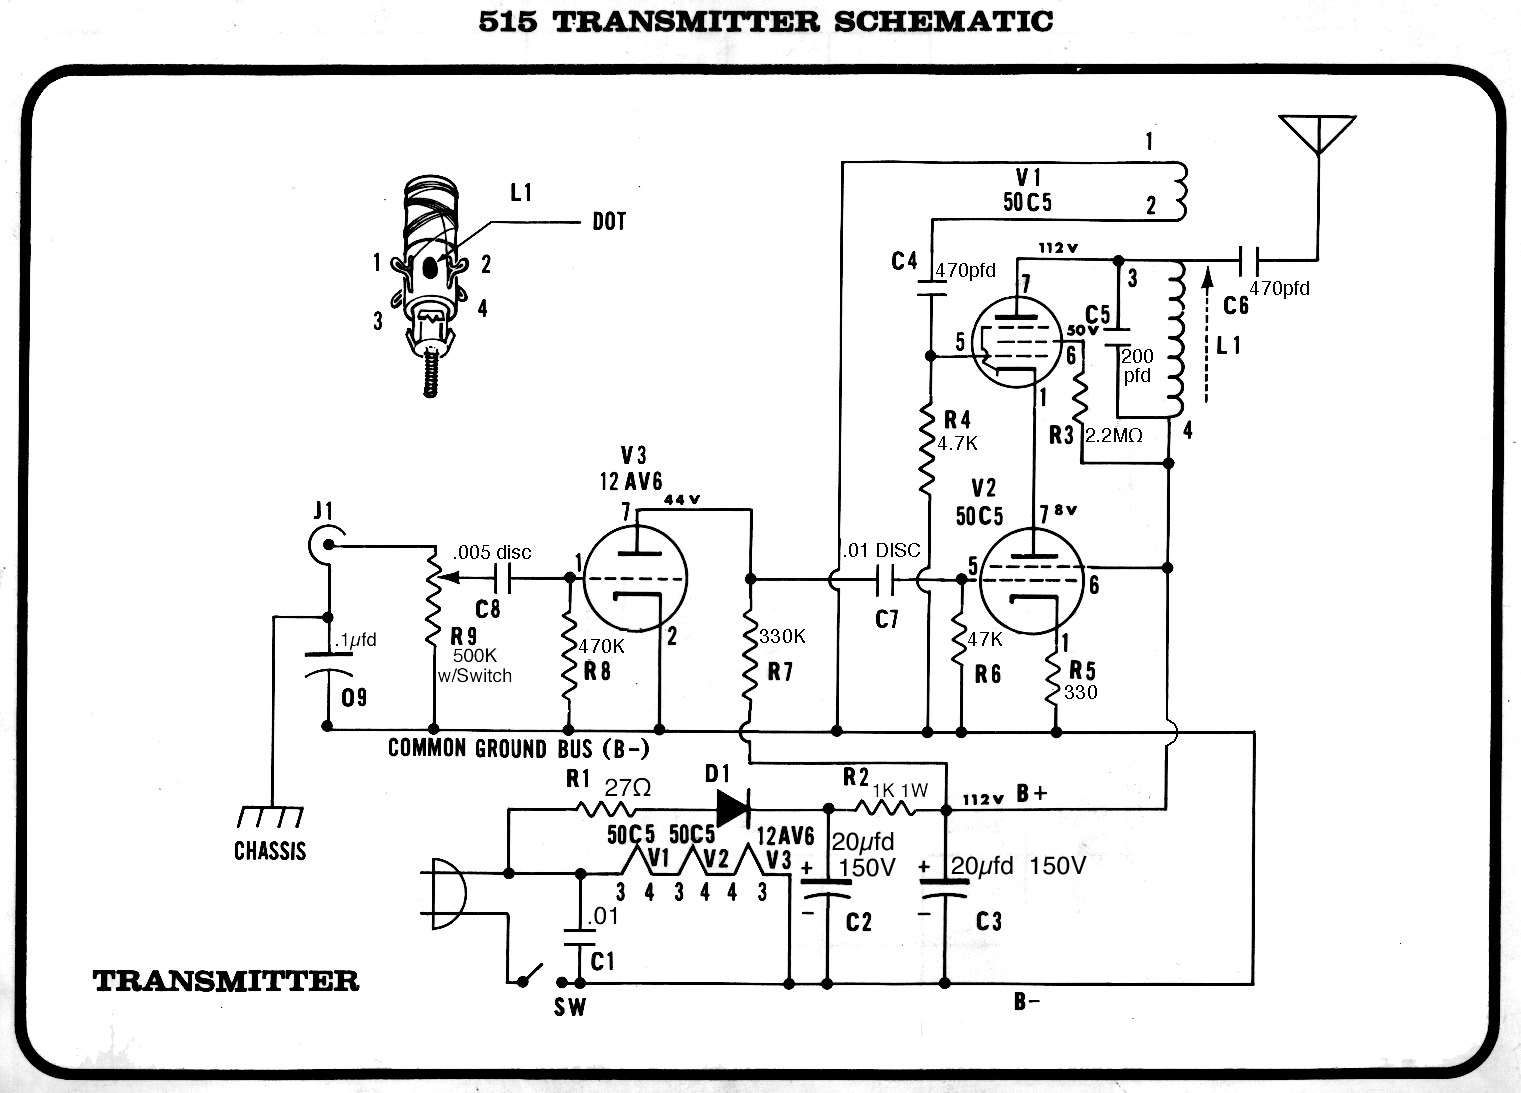 Index Of Orari Library Sw Hw Community Broadcasting Am Transmitter Circuit Diagram 515